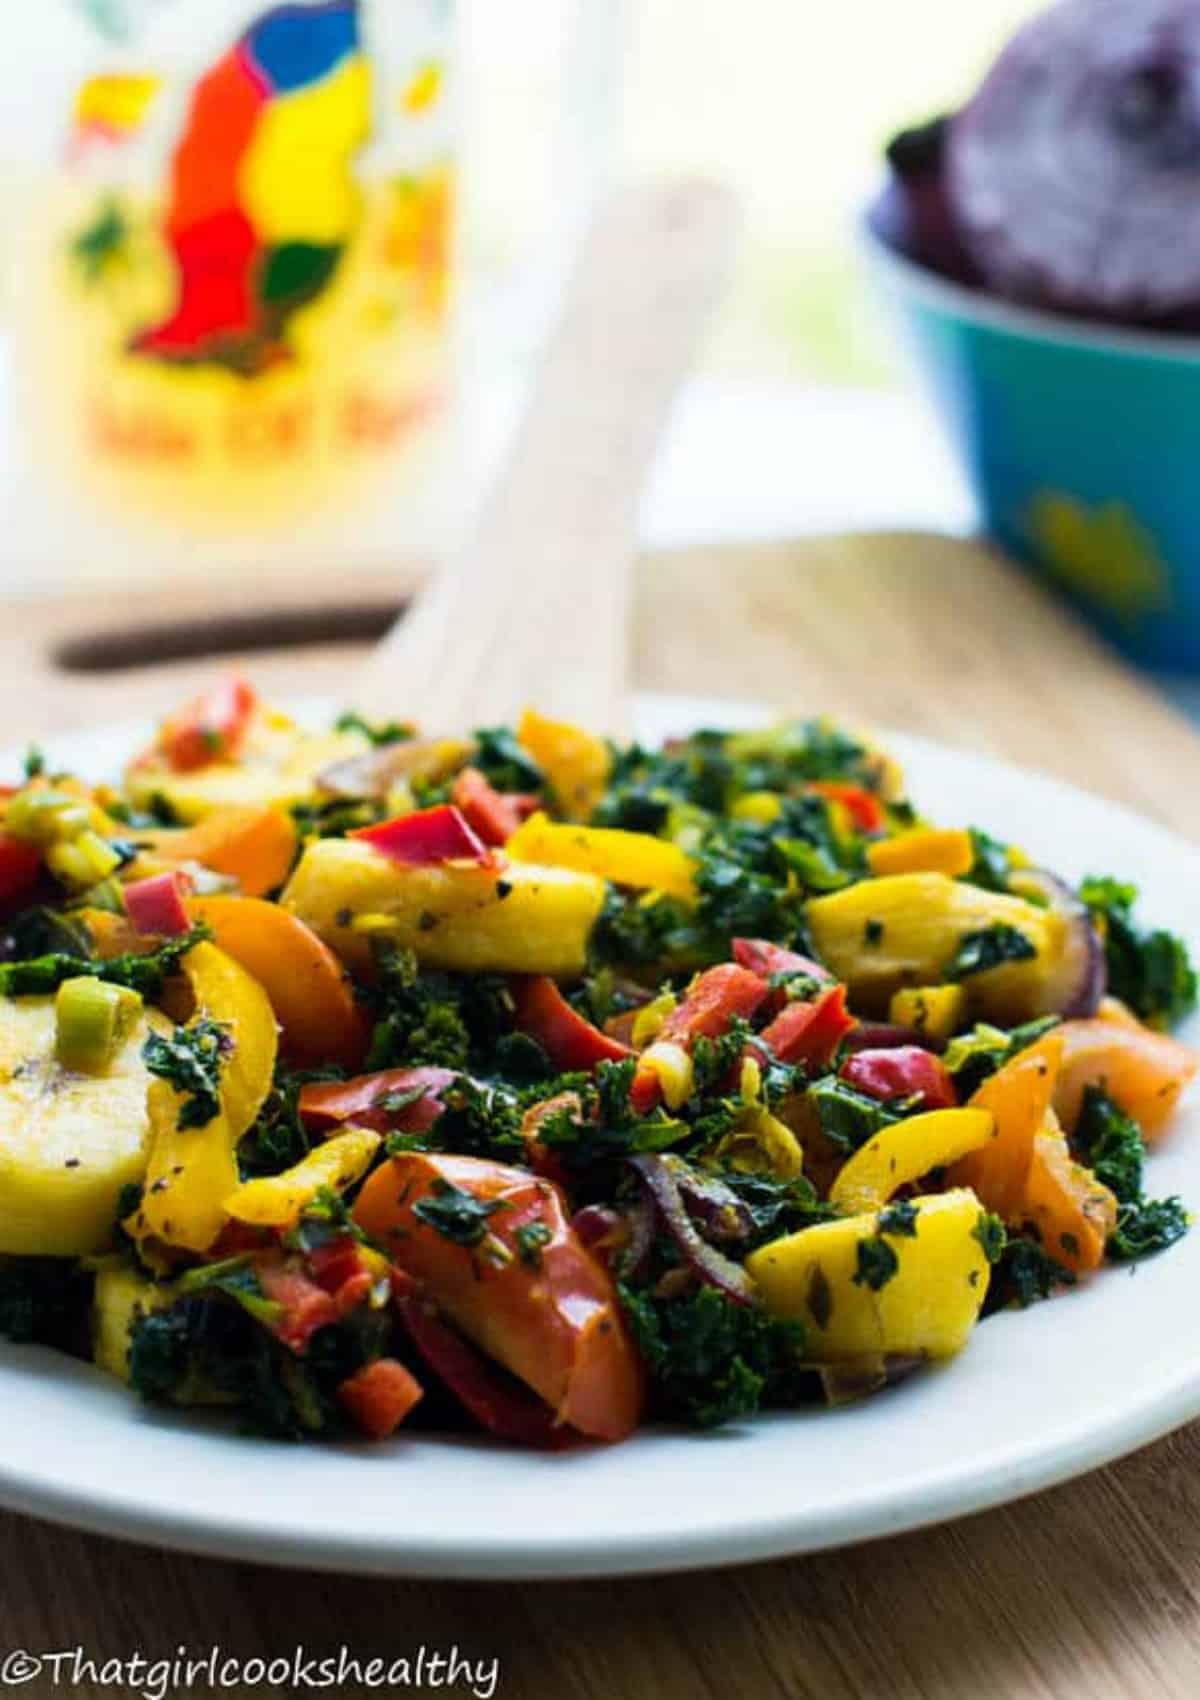 Vegetables with drink behind